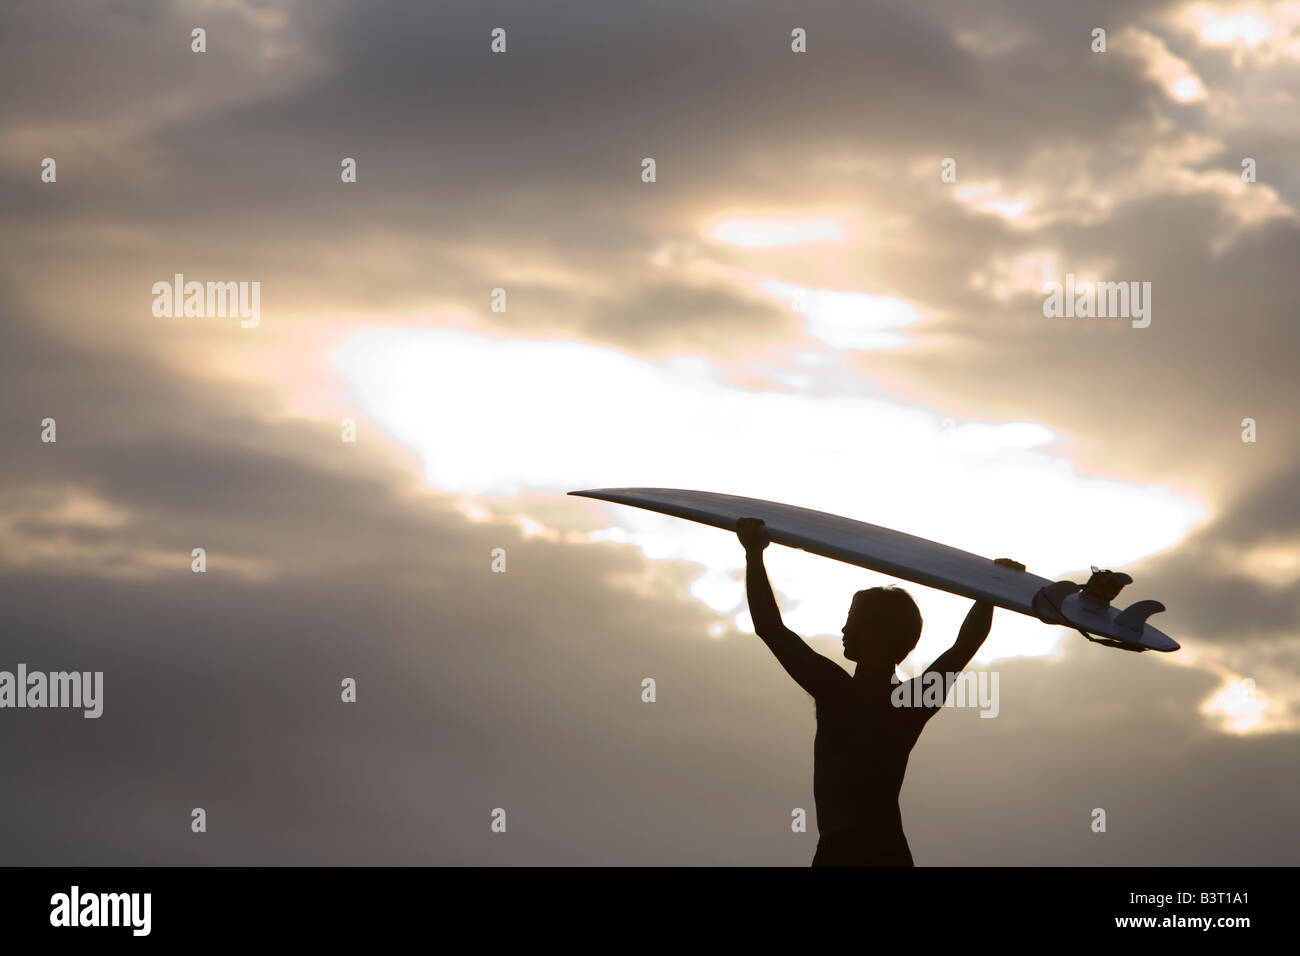 A surfer on Muriwai Beach, New Zealand - Stock Image